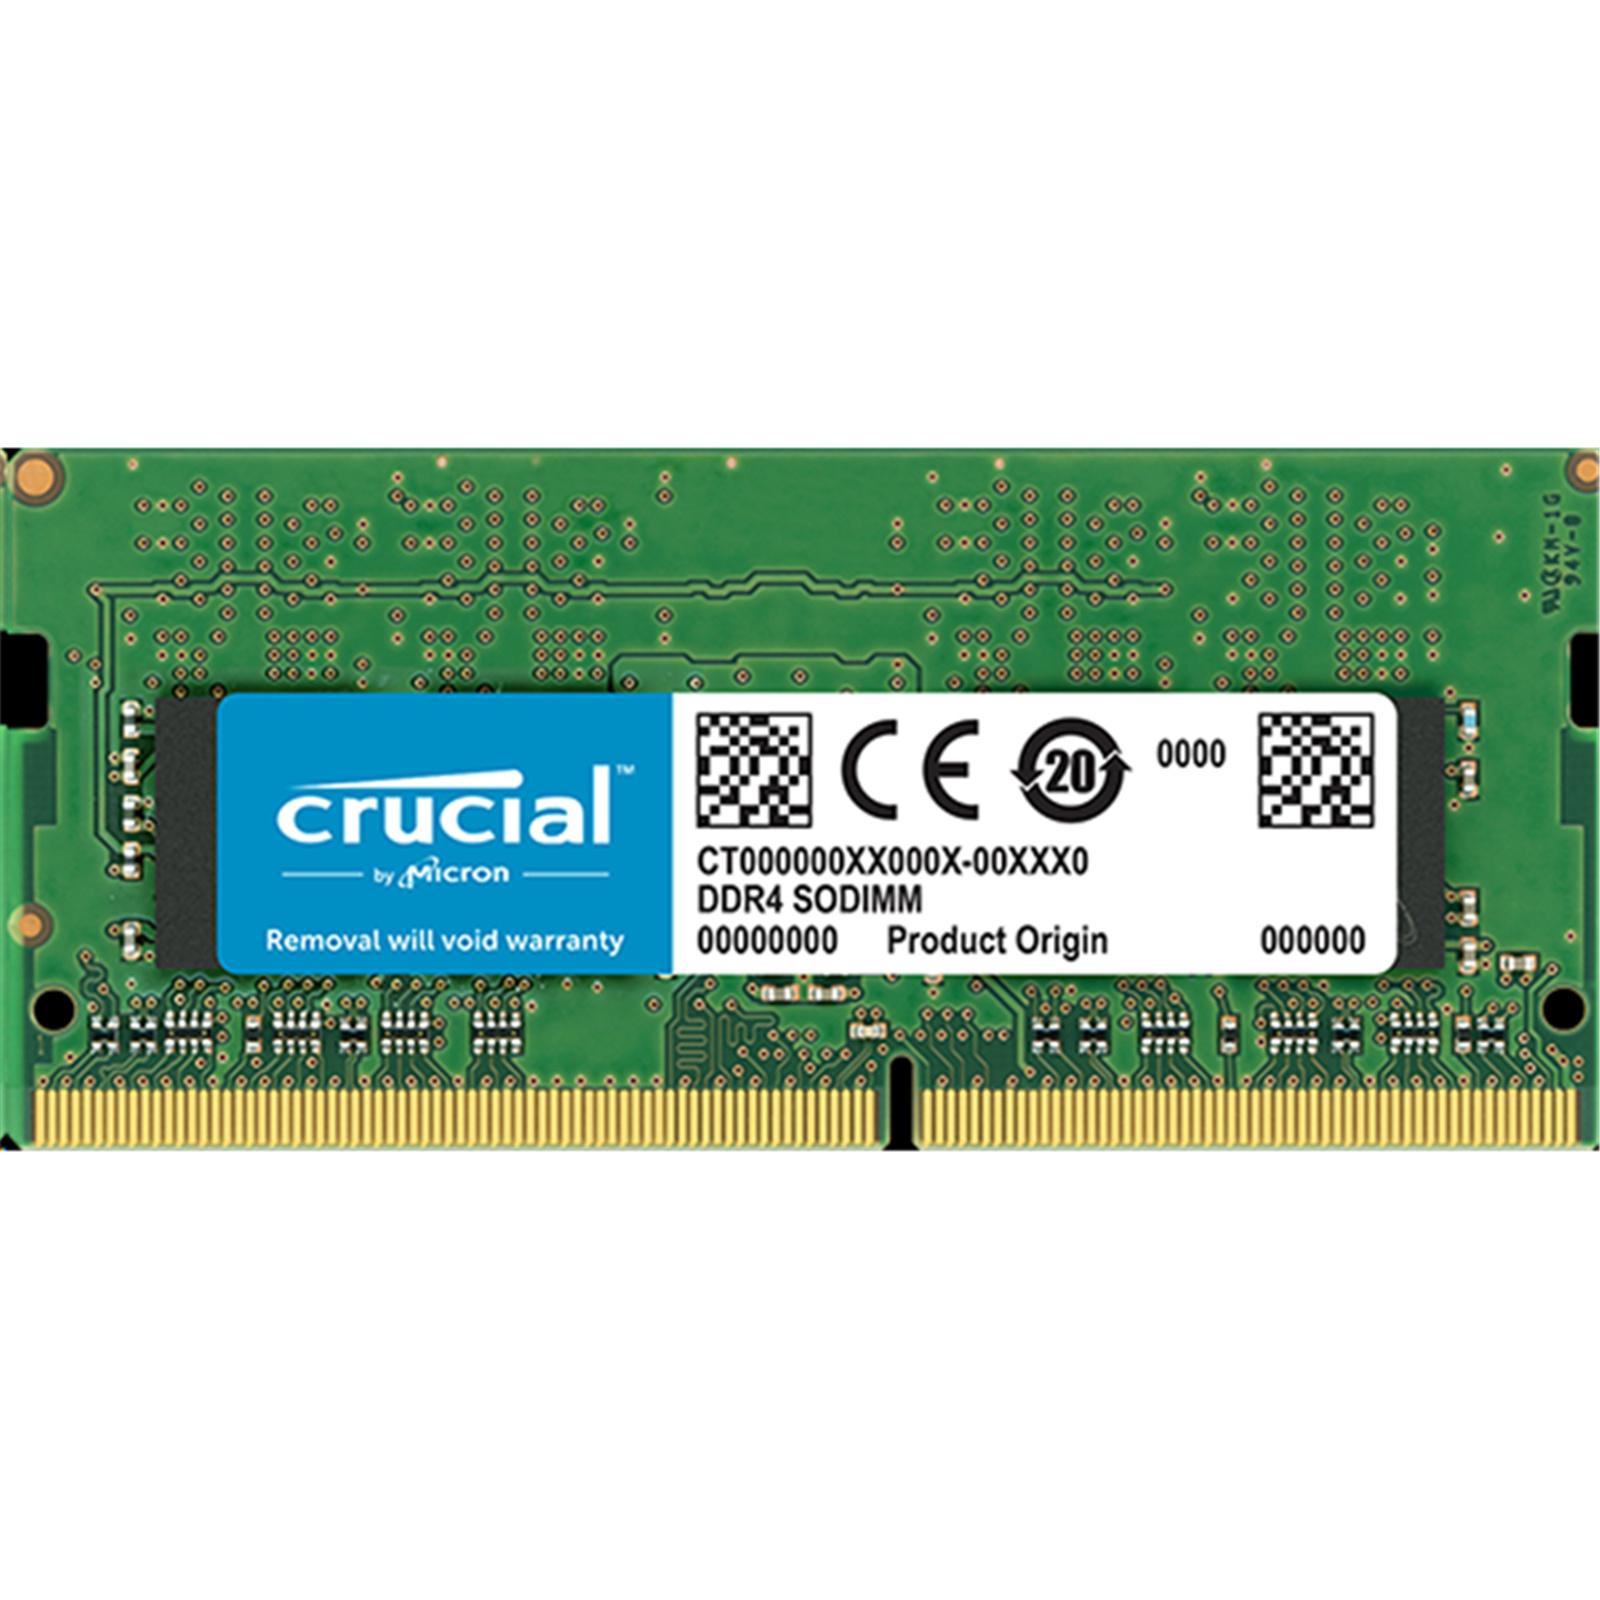 Buy the Crucial 8GB DDR4 SODIMM 2400 MT/s (PC4-19200) CL17 SR x8